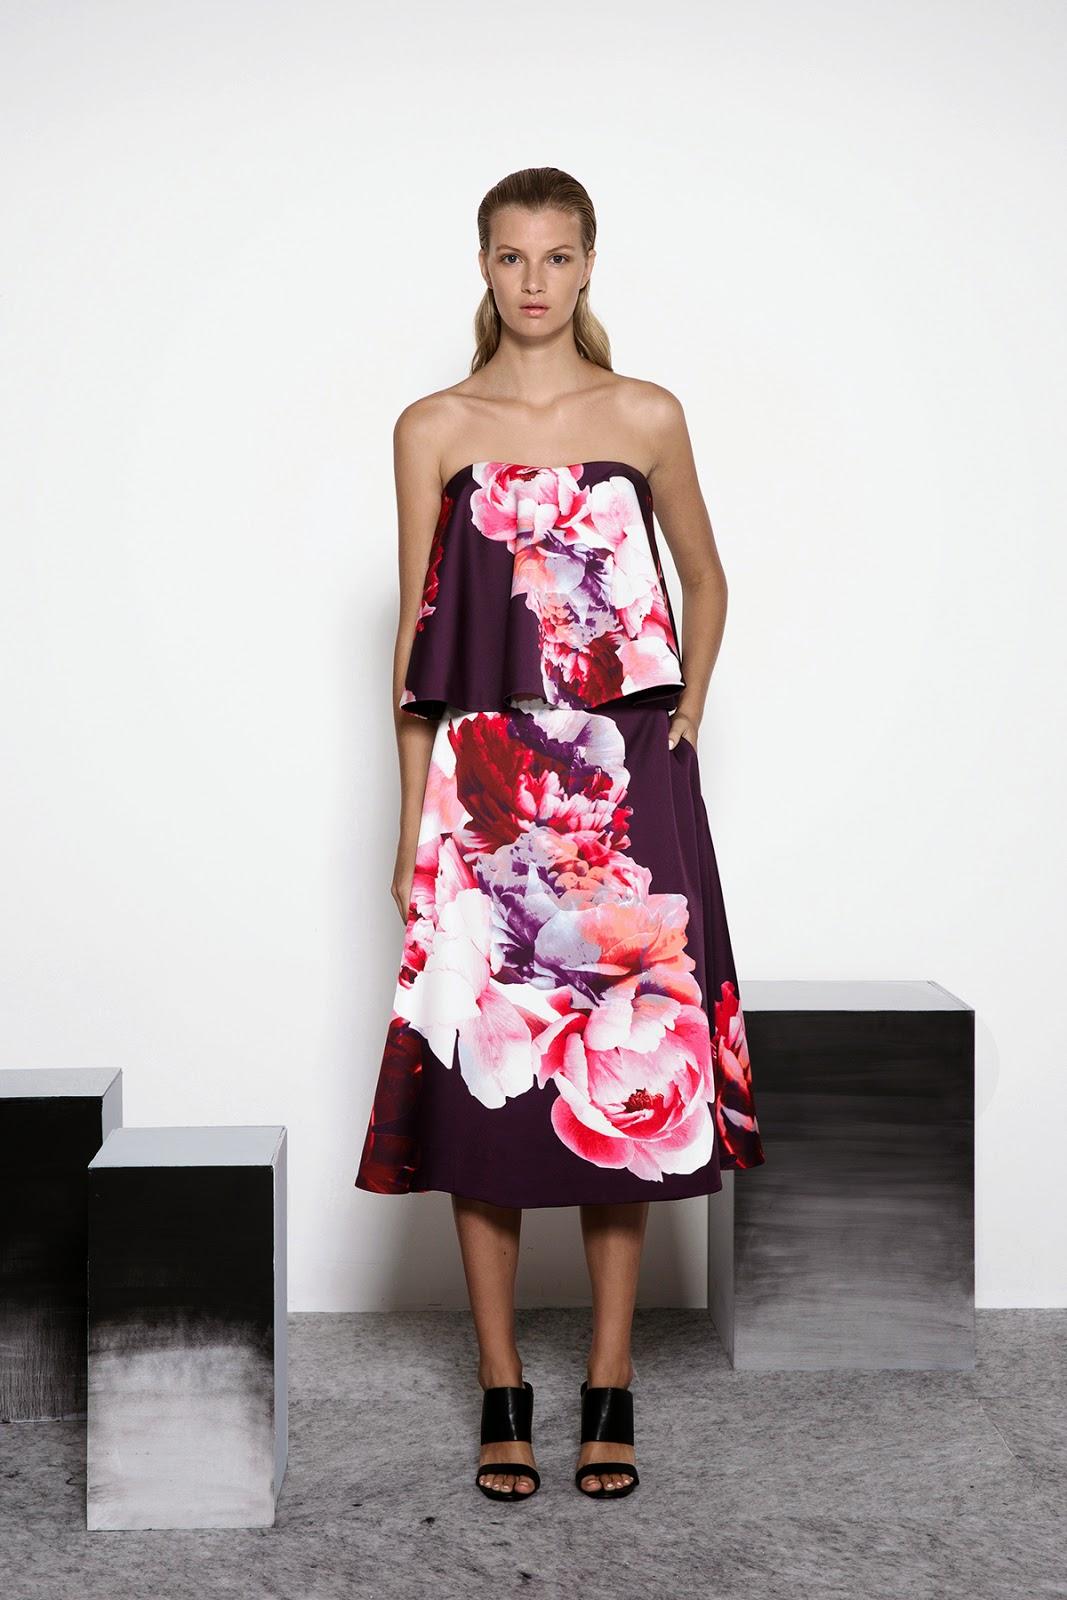 WHOLESALE Australian Fashion Labels 76